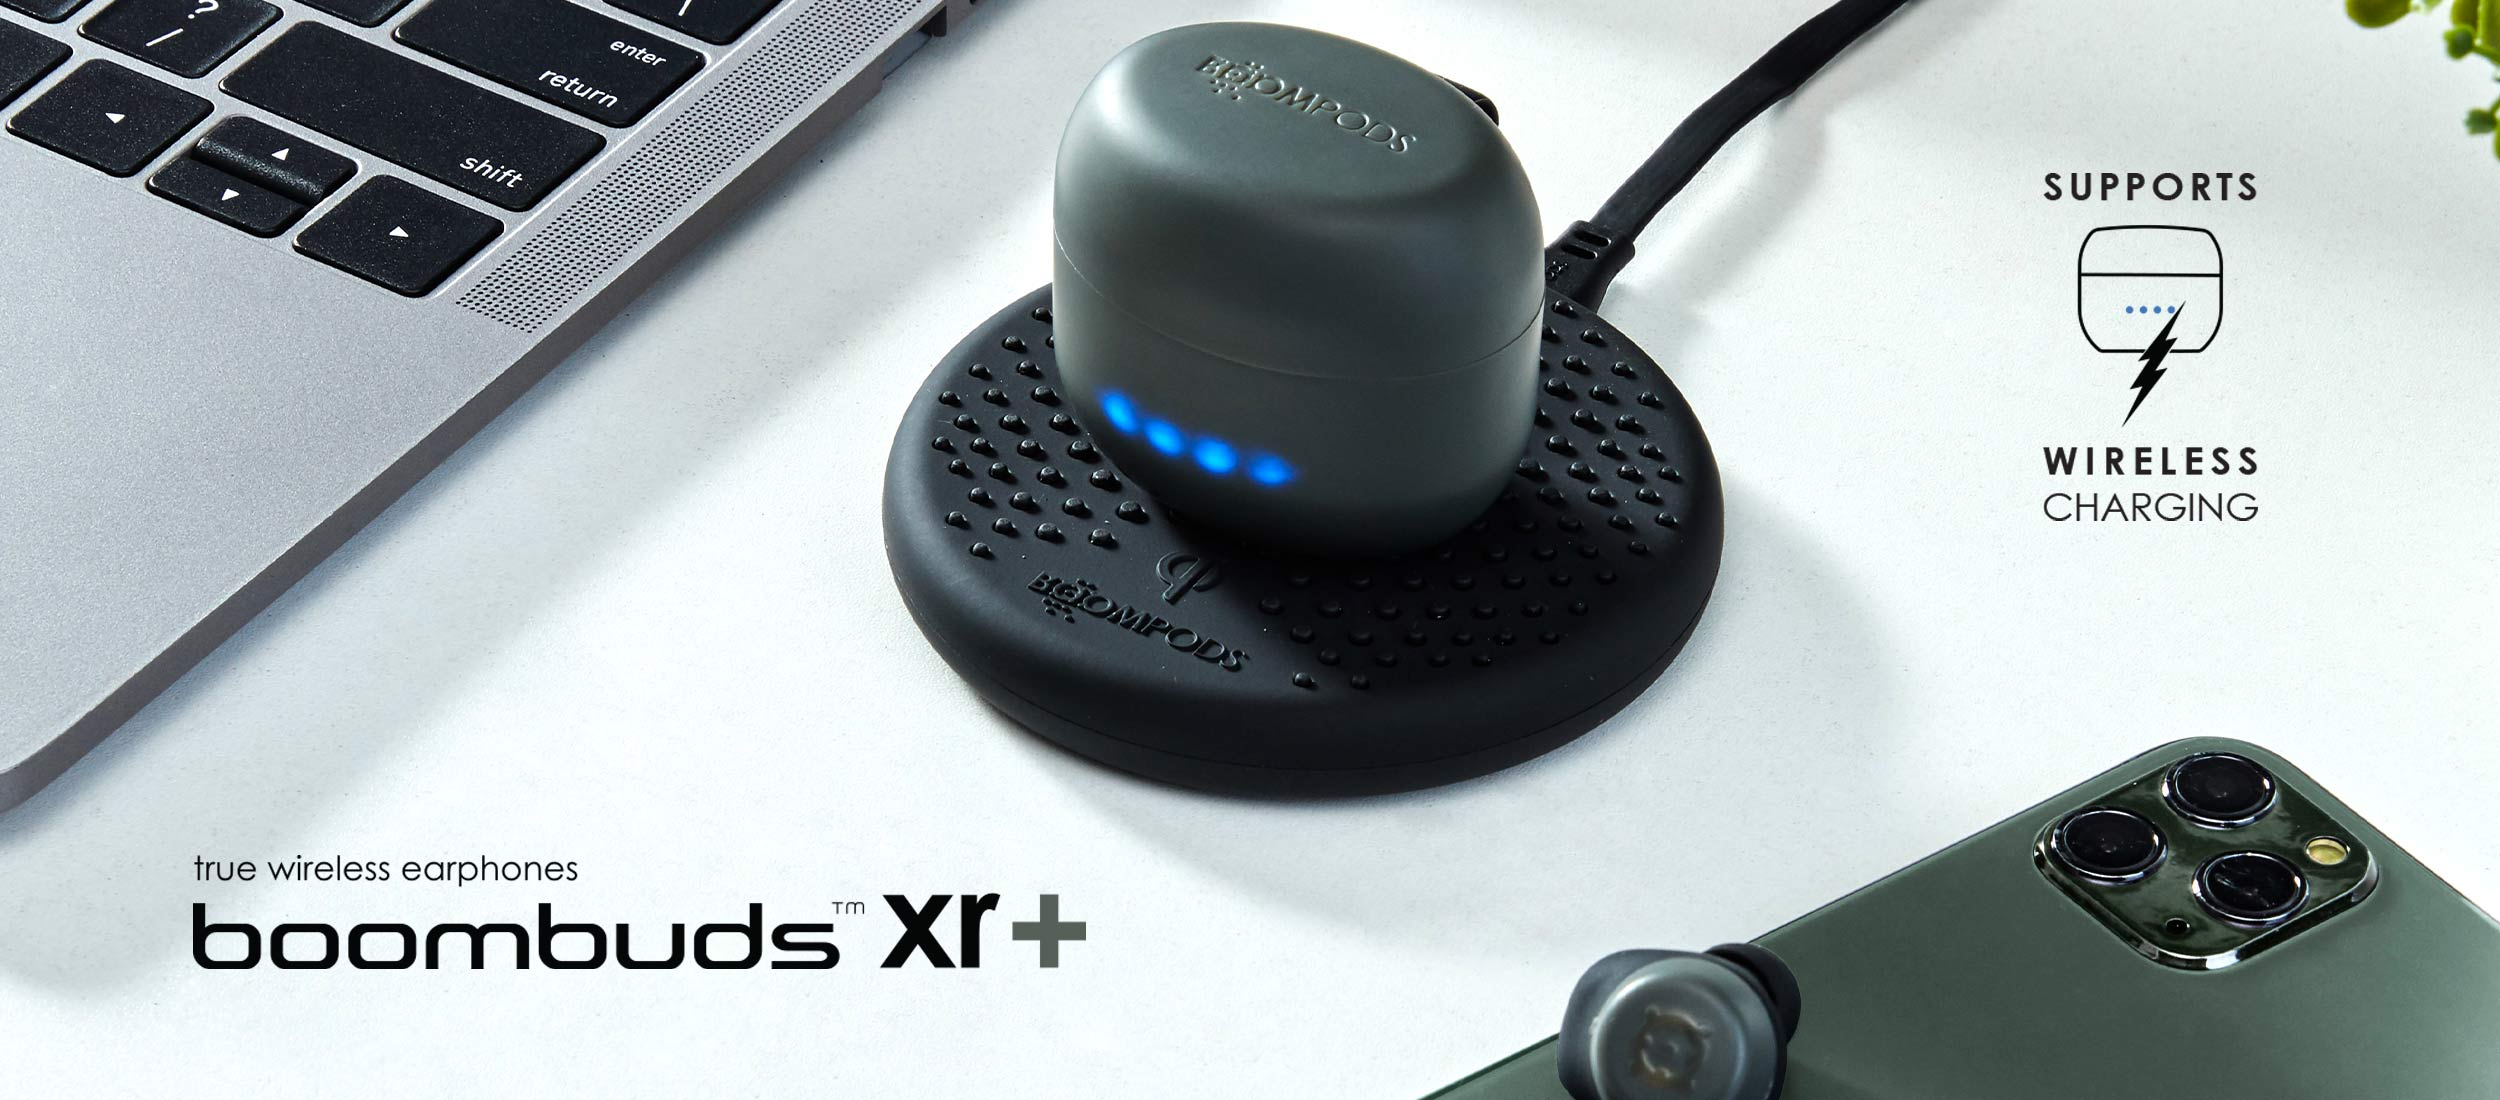 Boombuds XR+ - True Wireless Earbuds